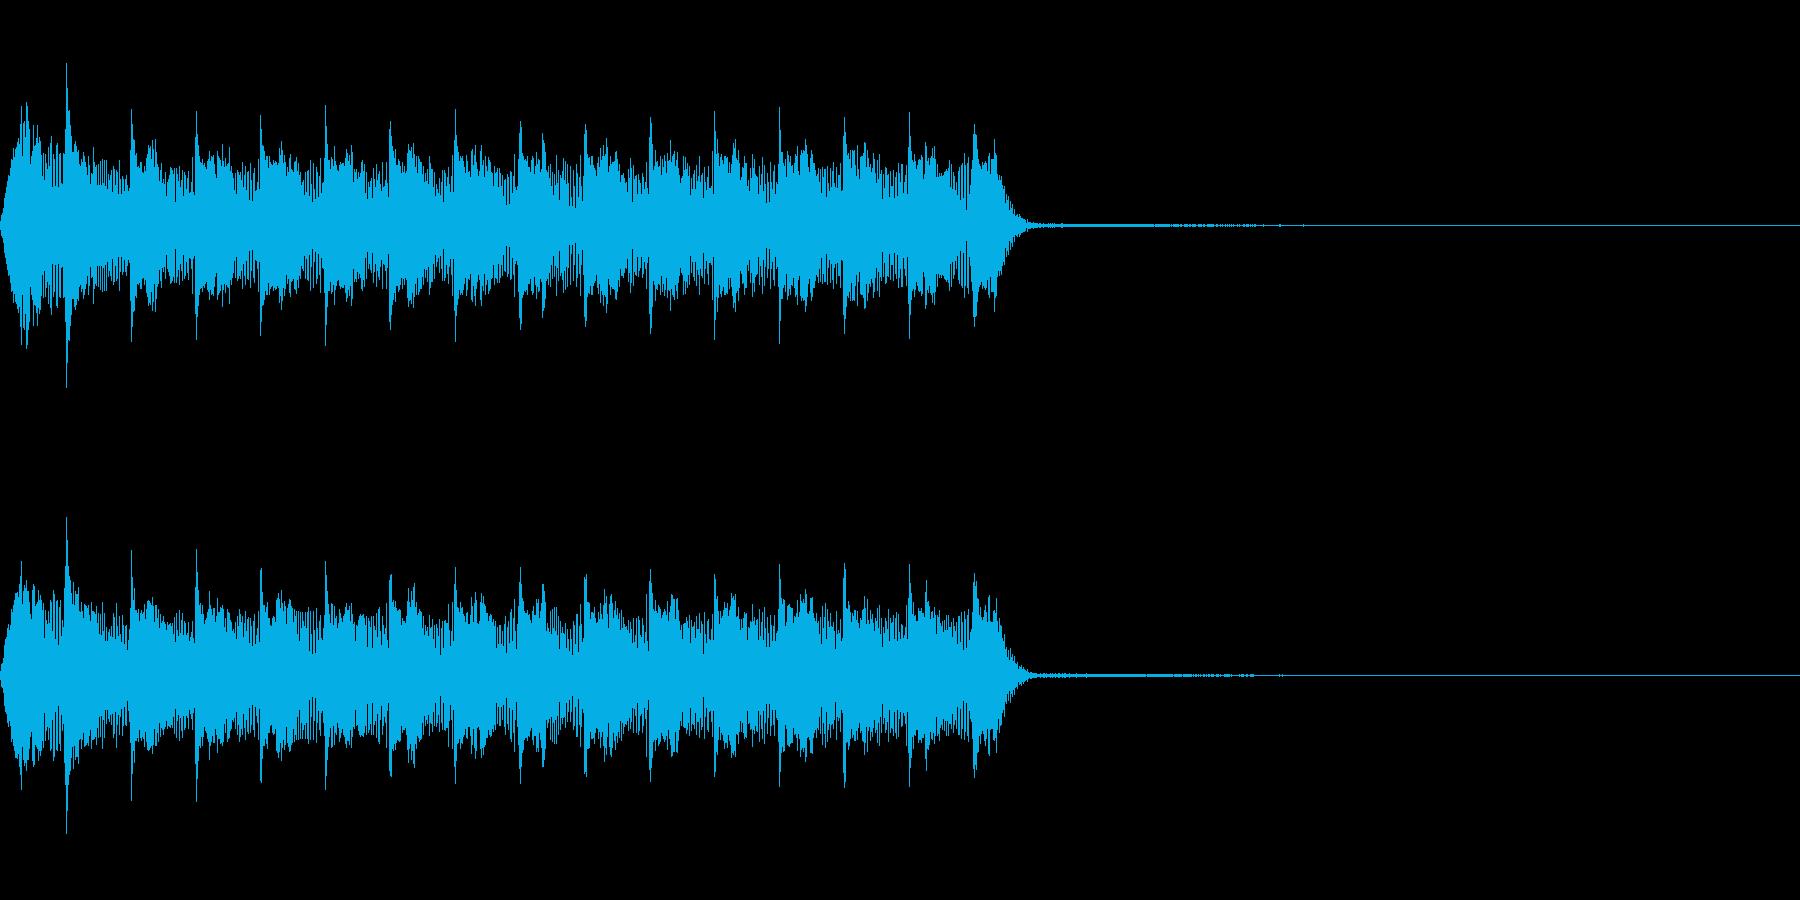 Razor レーザー小銃の連射音 1の再生済みの波形